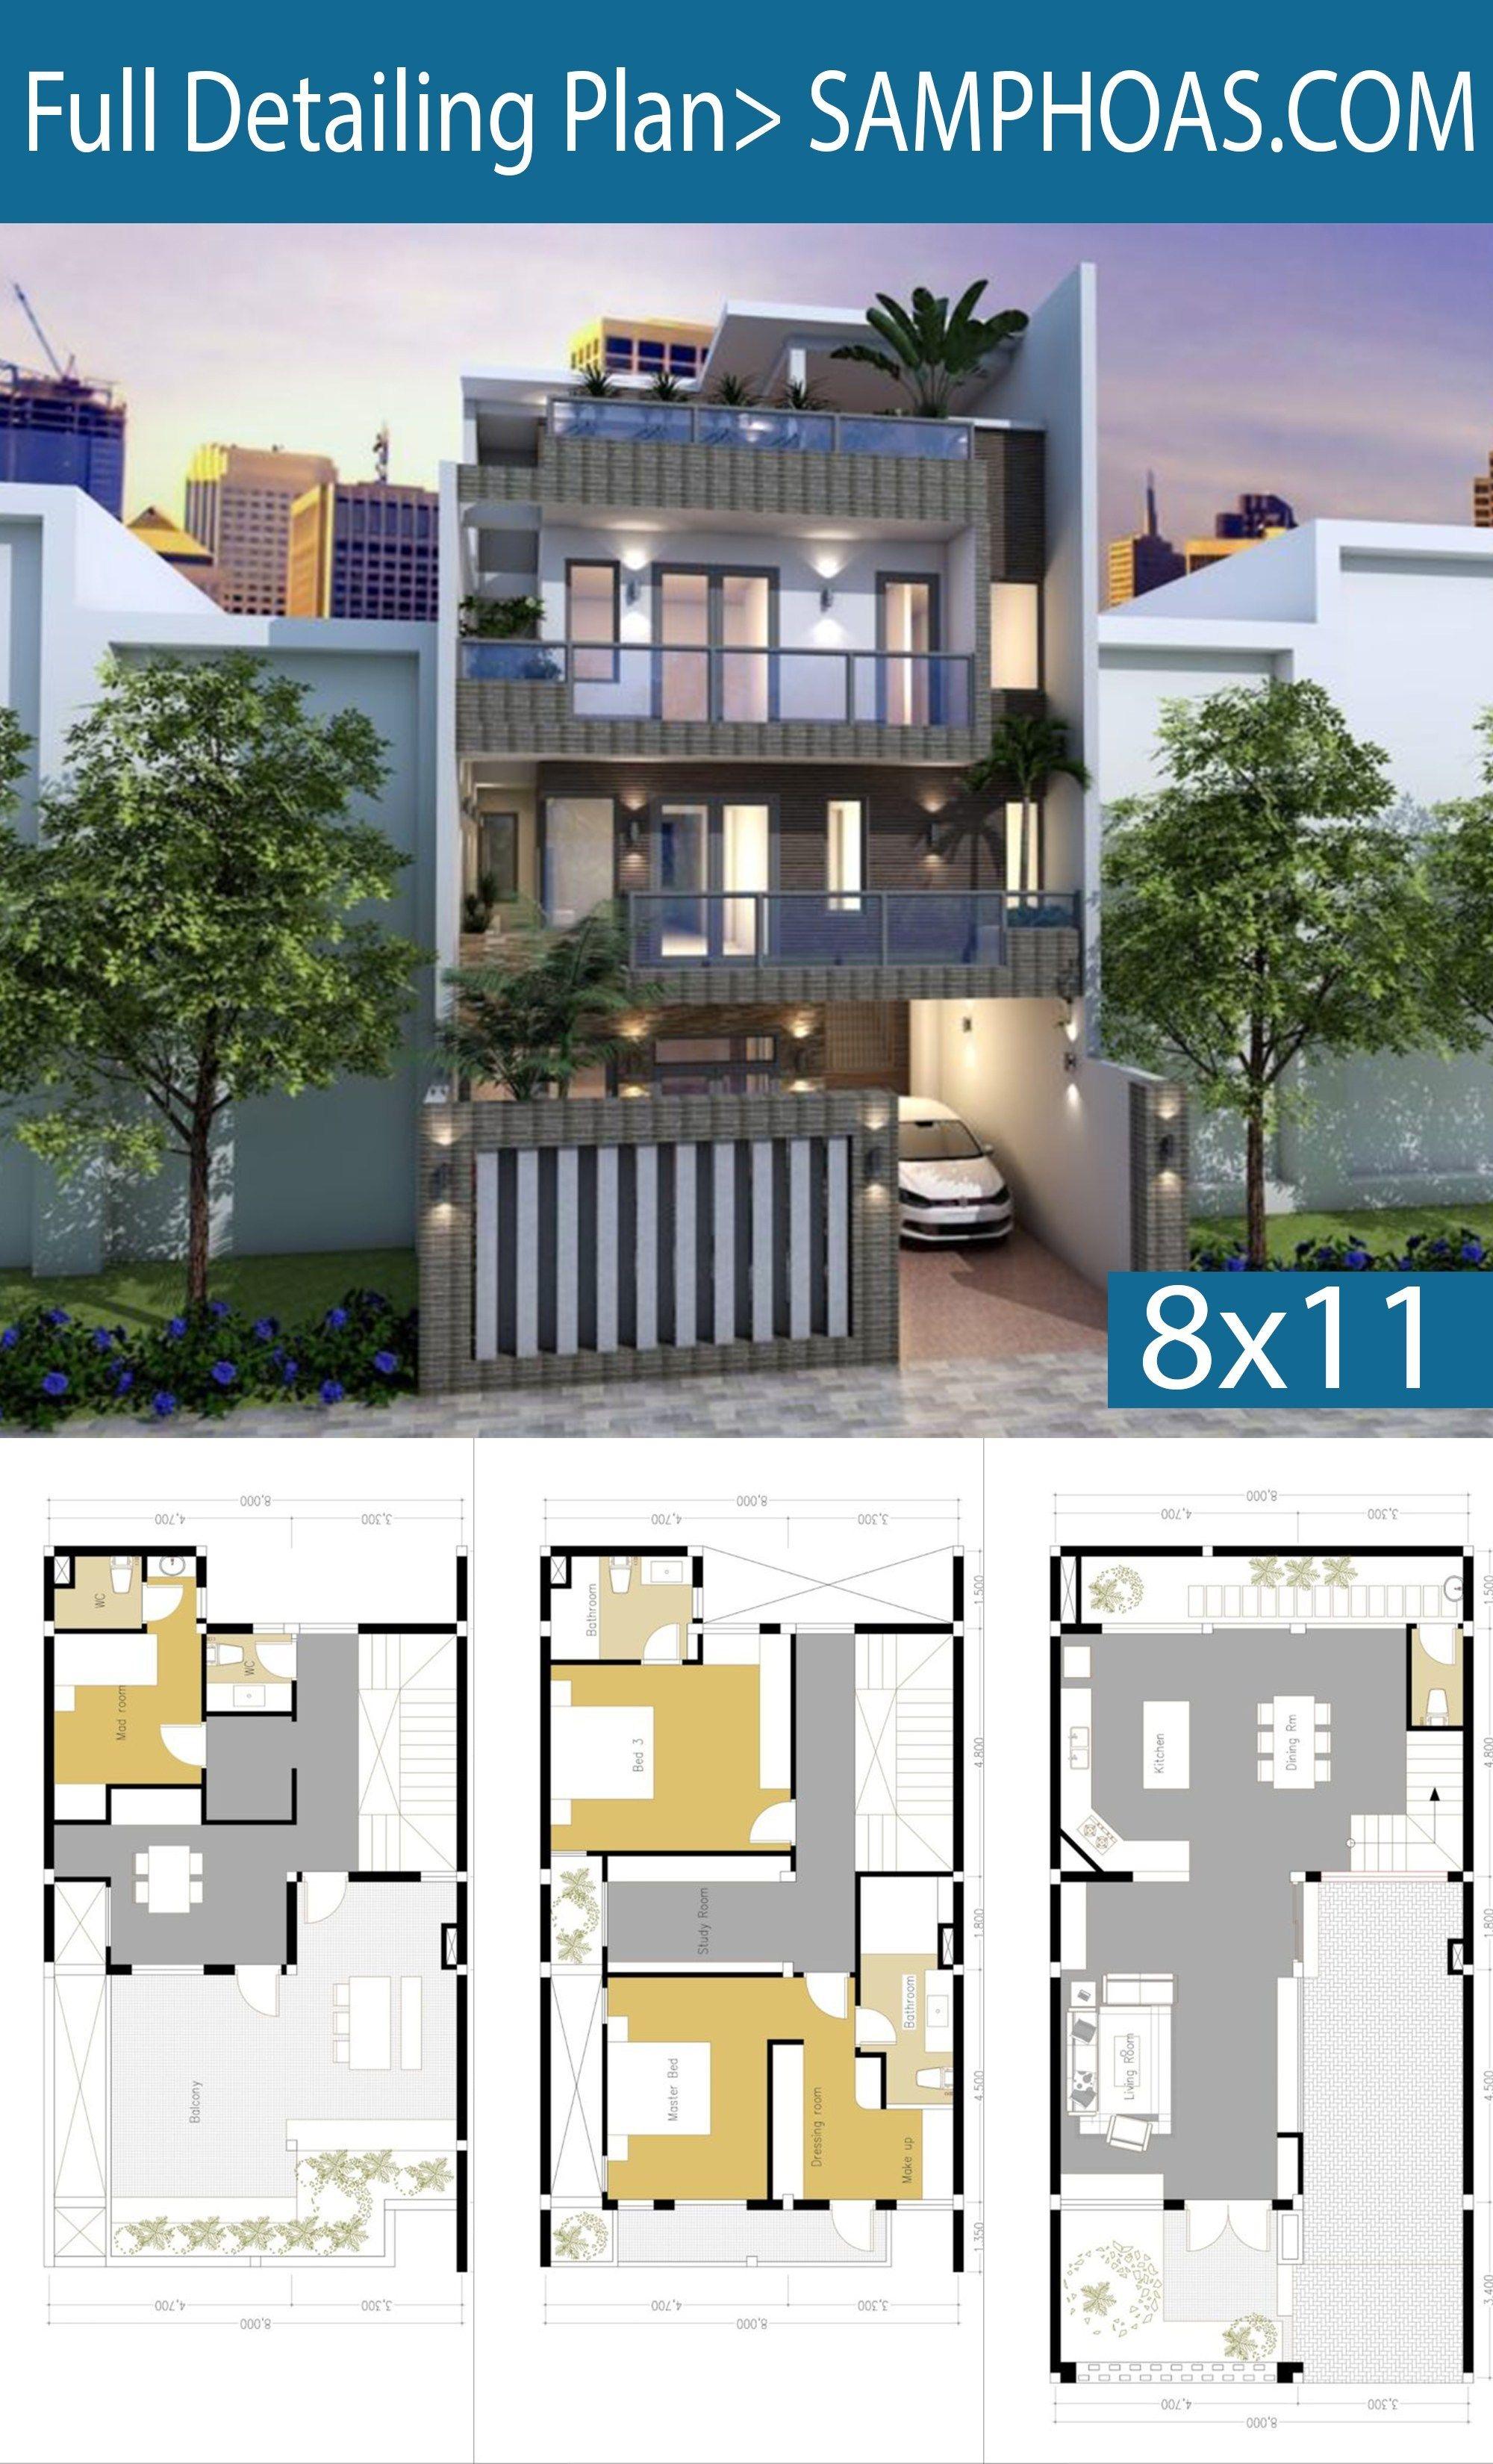 5 Bedroom 4 Story House Plan 8x11m Samphoas Plan Free House Design House Plans Model House Plan